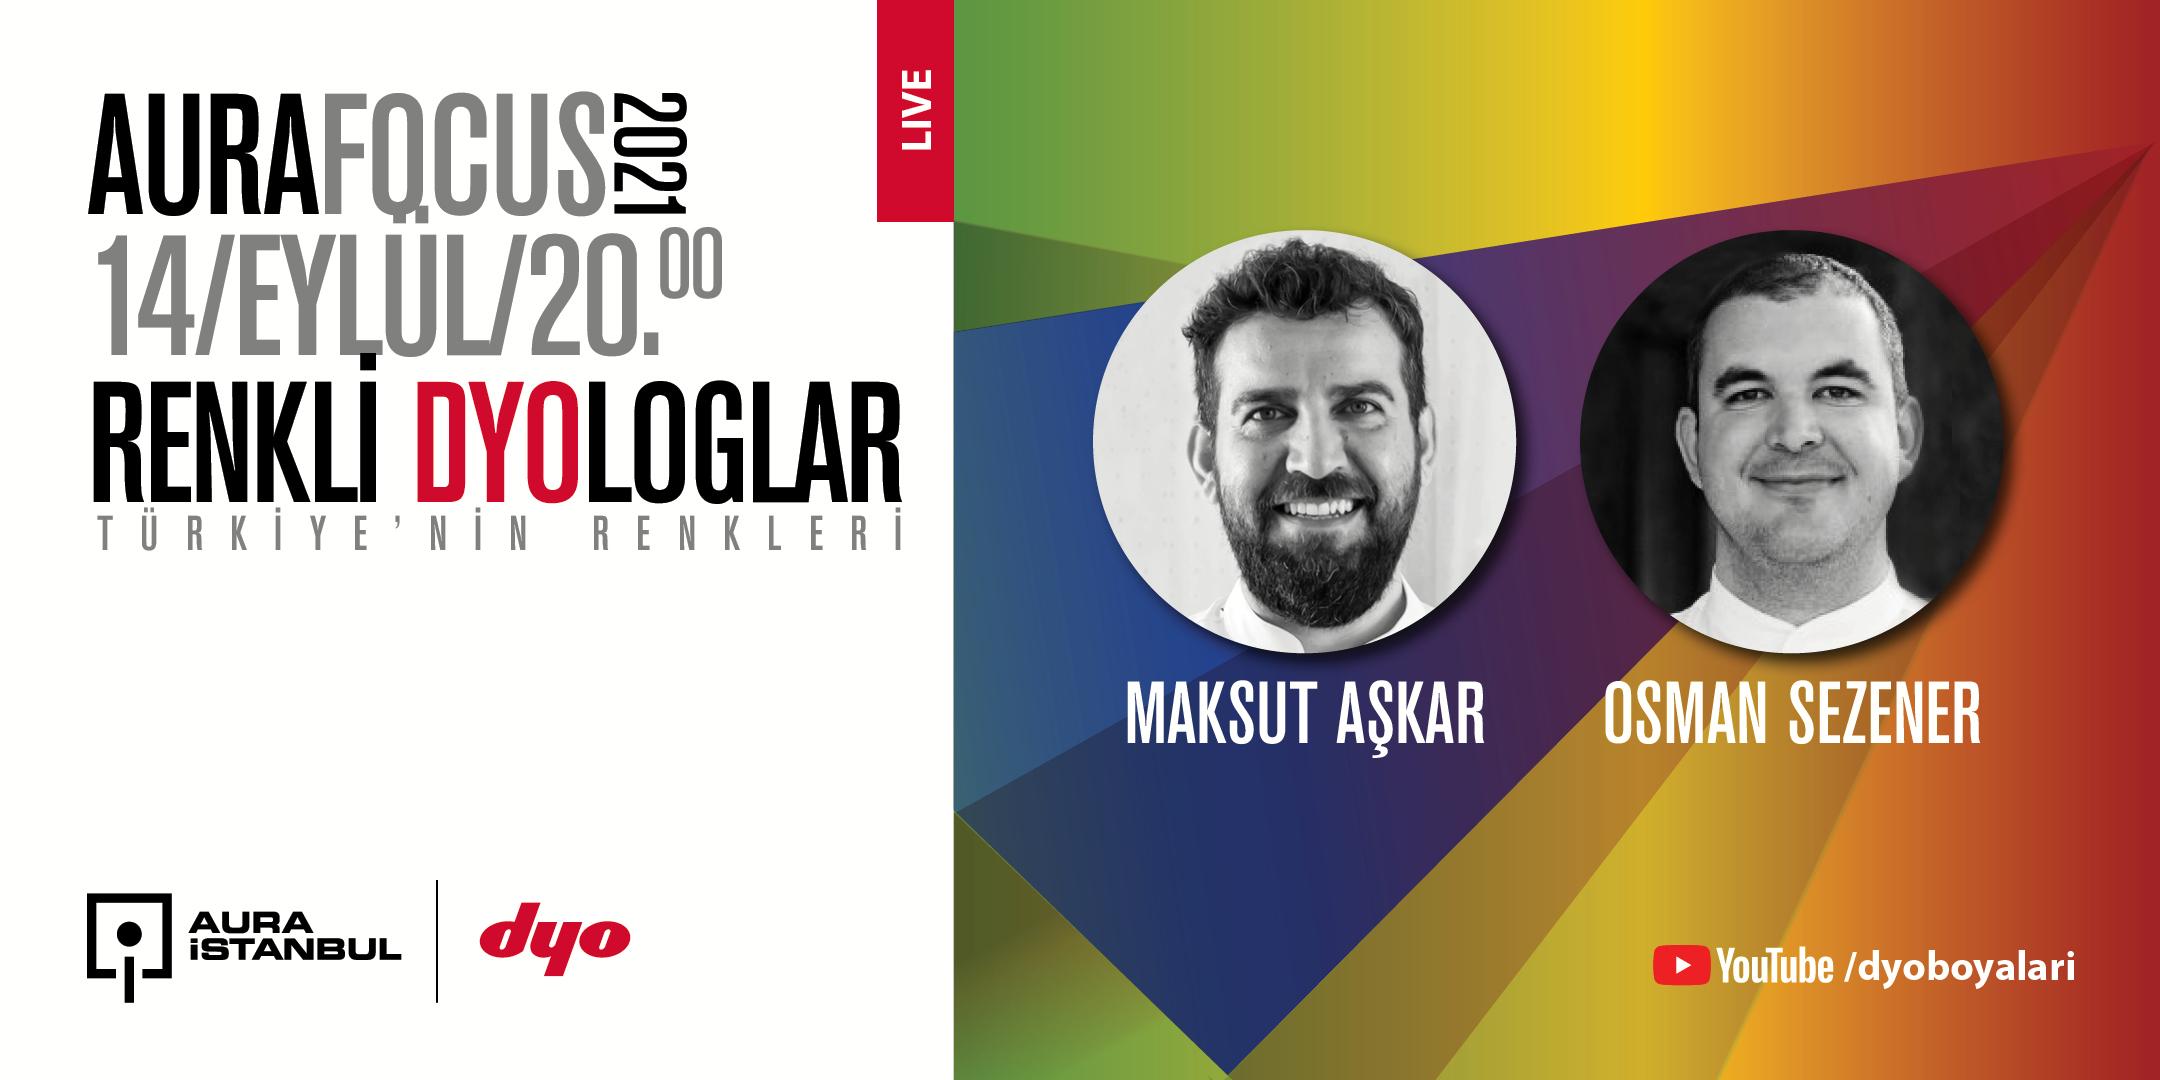 Renkli DYOloglar: Maksut Aşkar & Osman Sezener